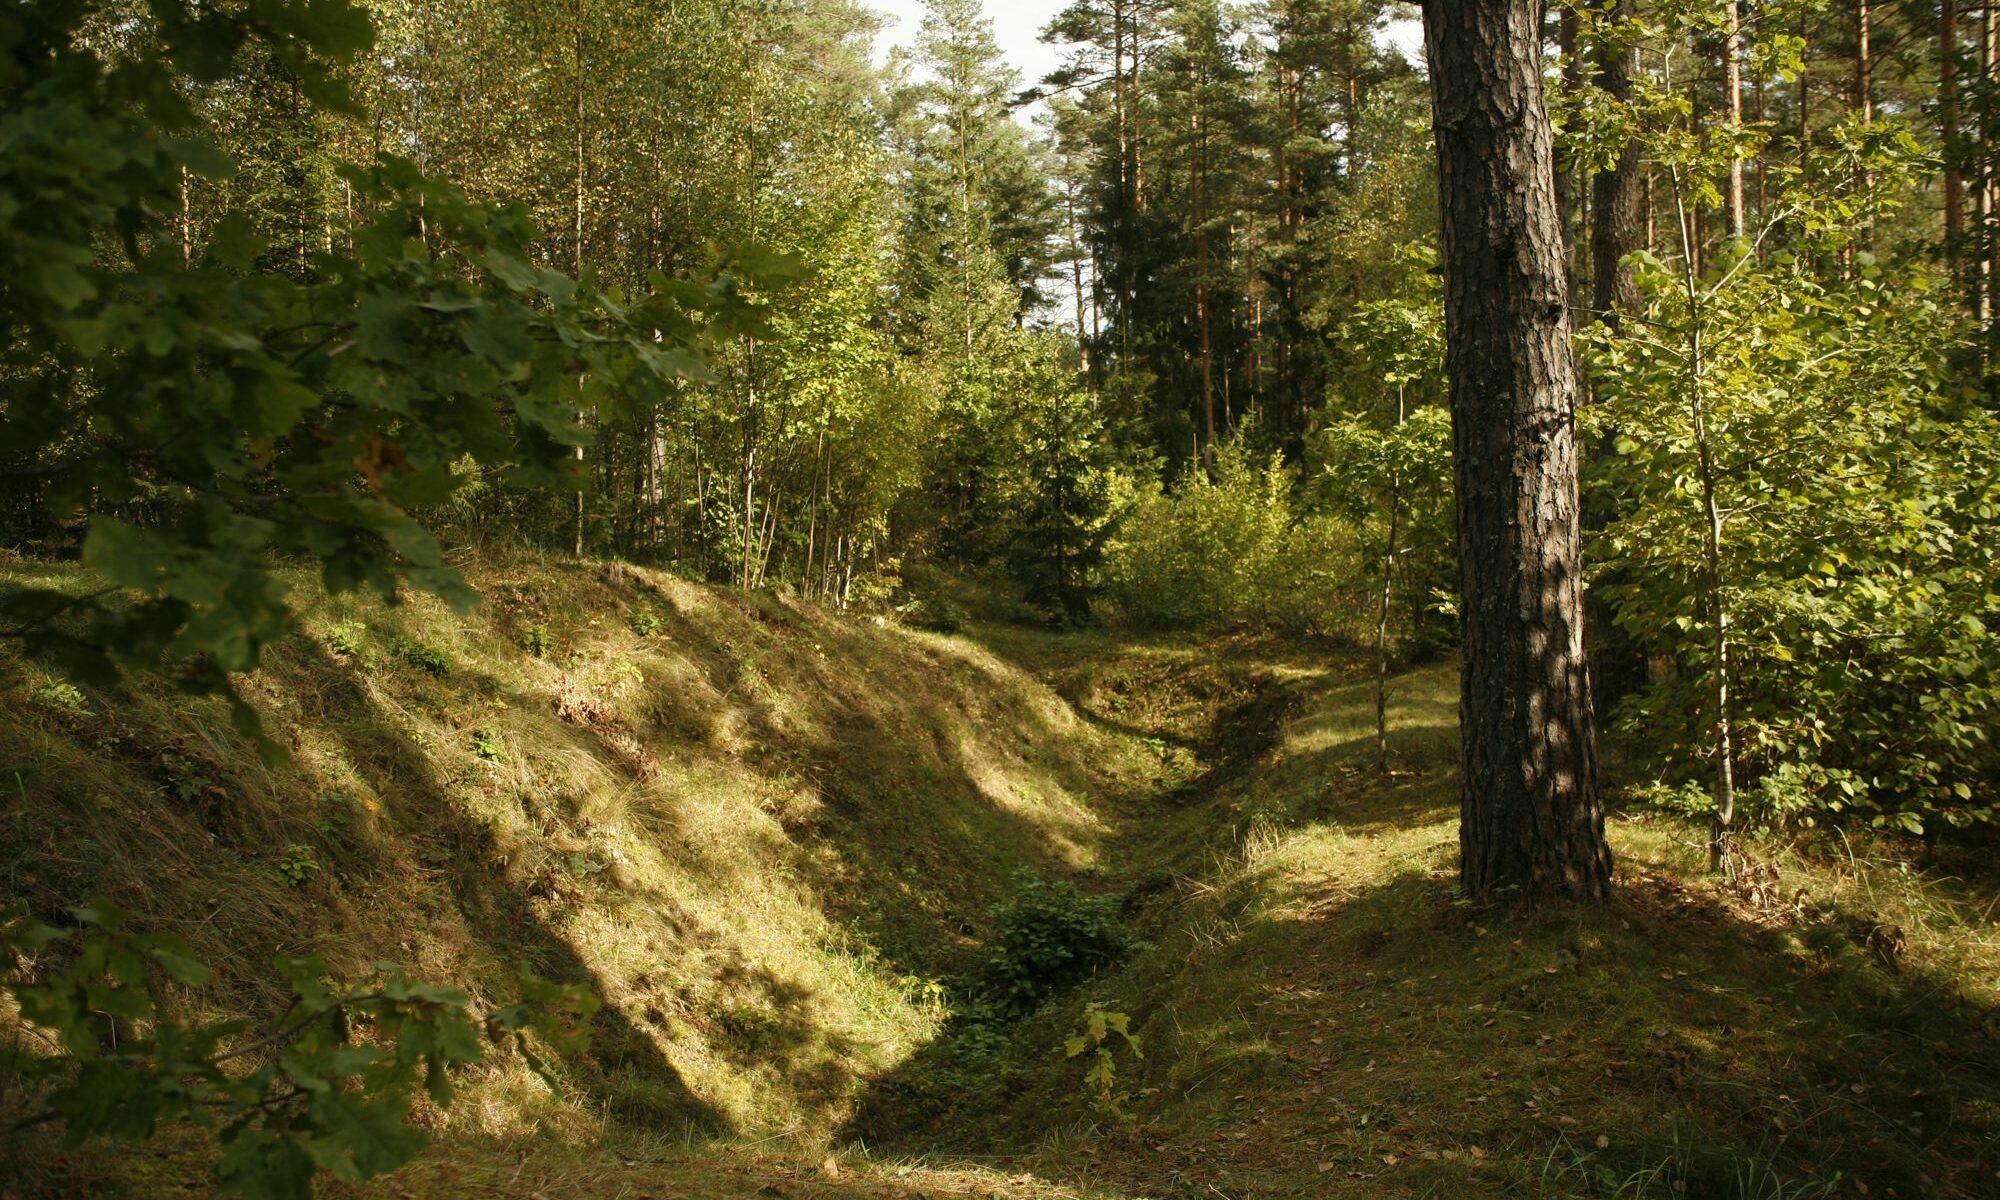 Header Image: Forest near Sabile, Latvia. Photo: Alexandra Klei, September 30, 2017.